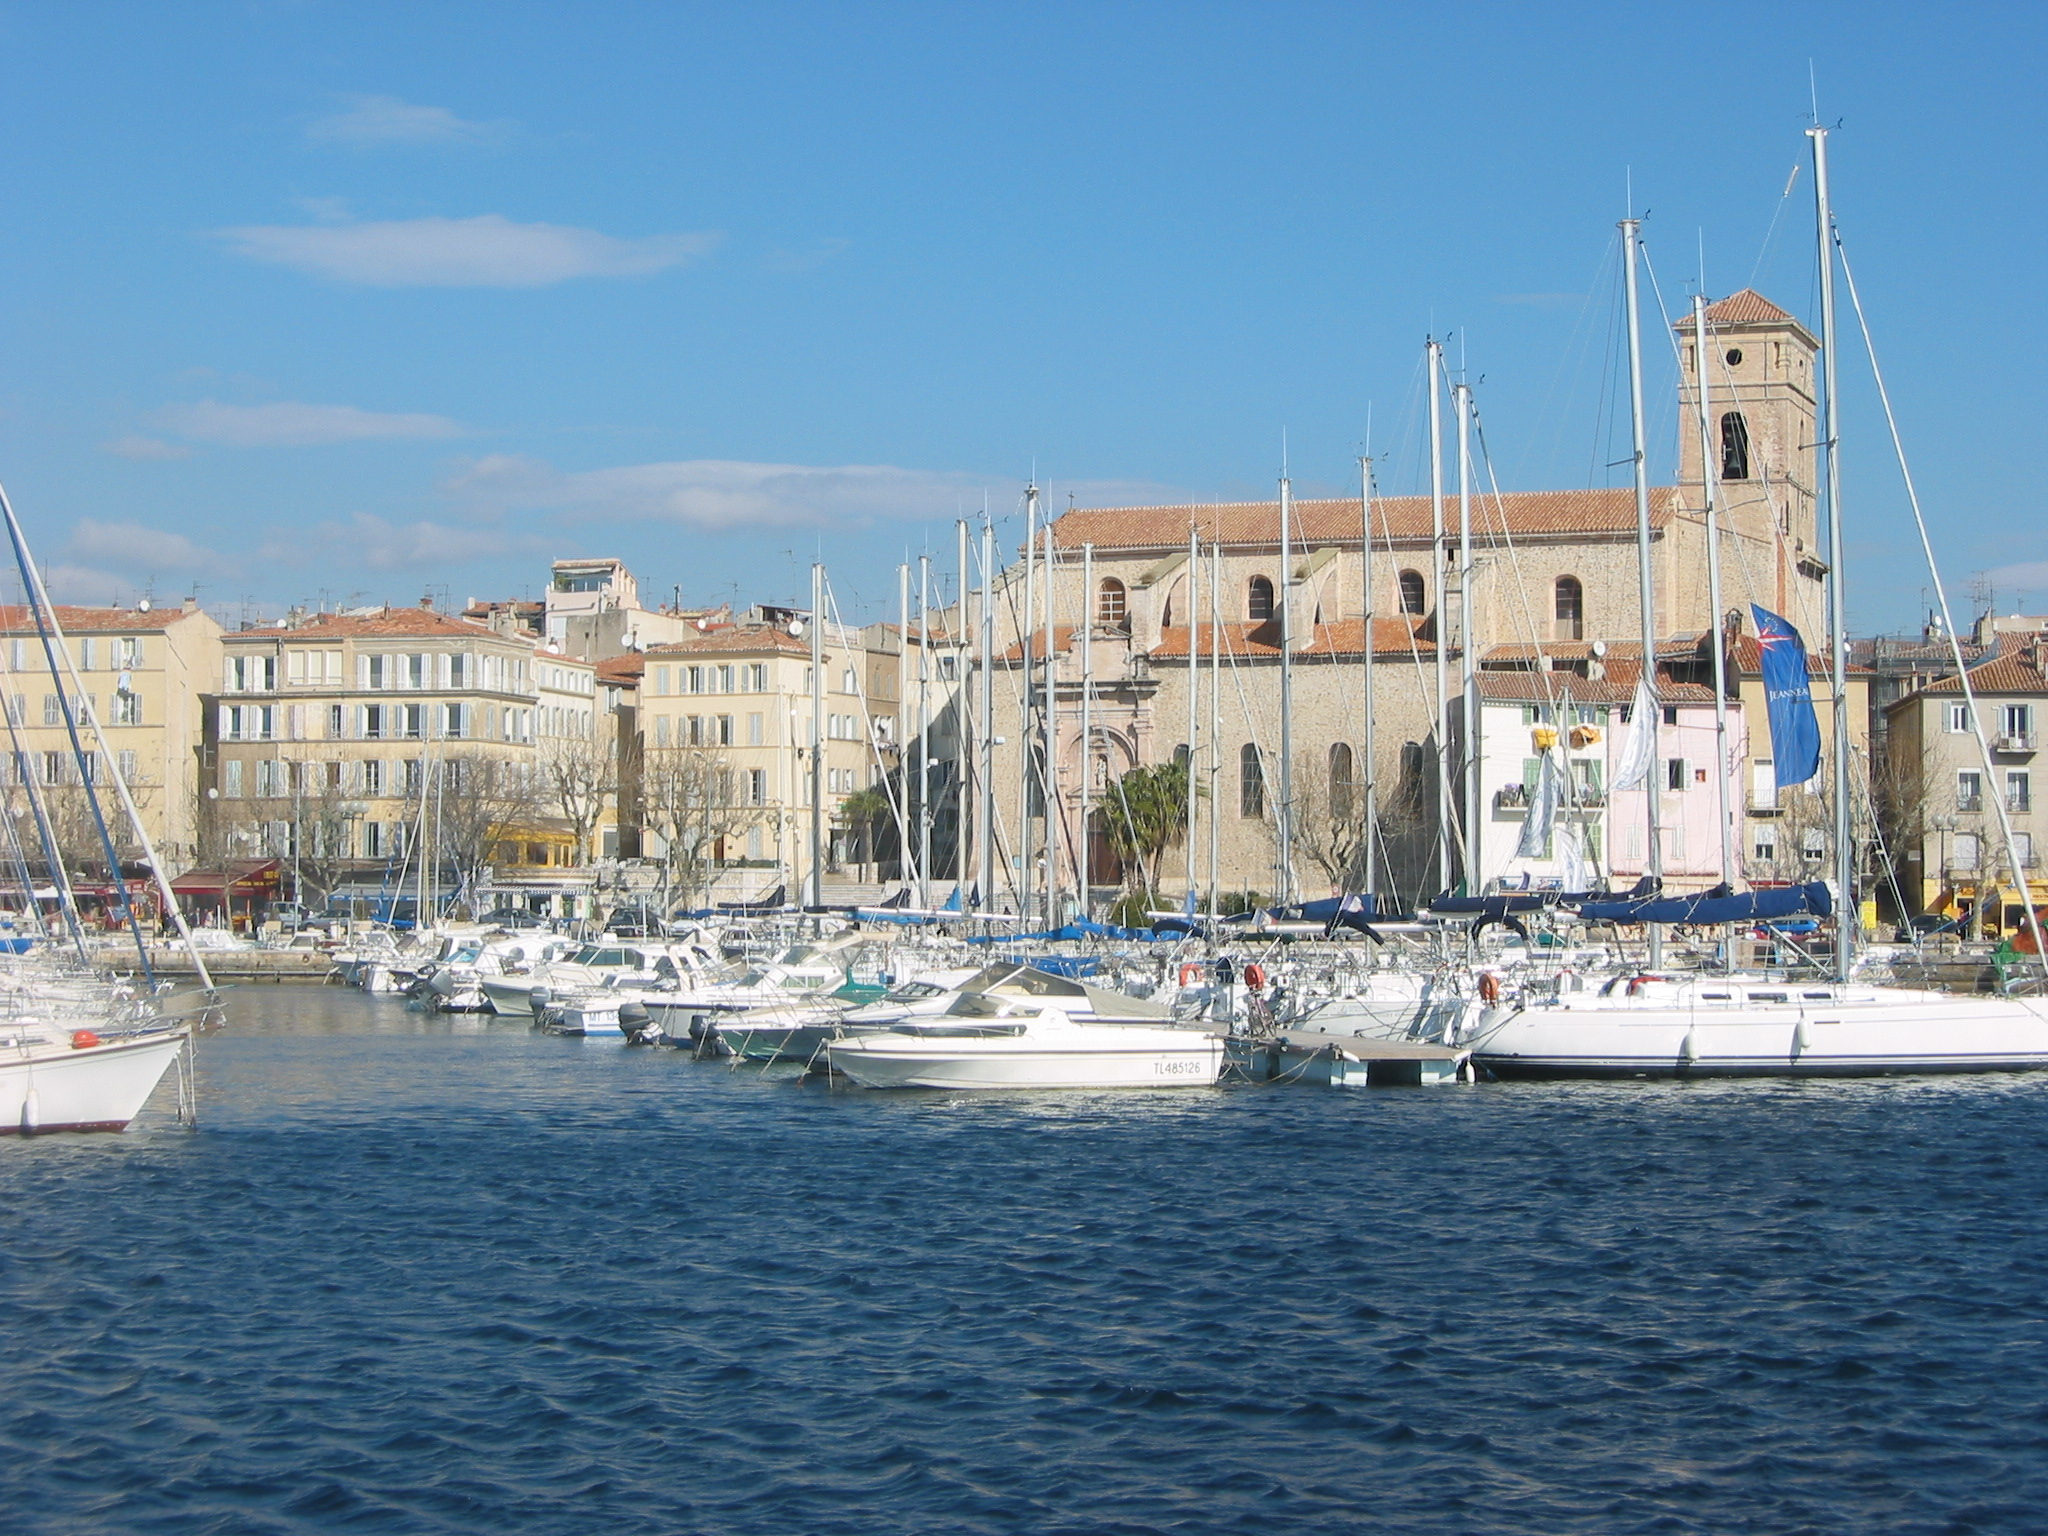 La Ciotat France  City pictures : Dosiero:La Ciotat eglise et port Vikipedio